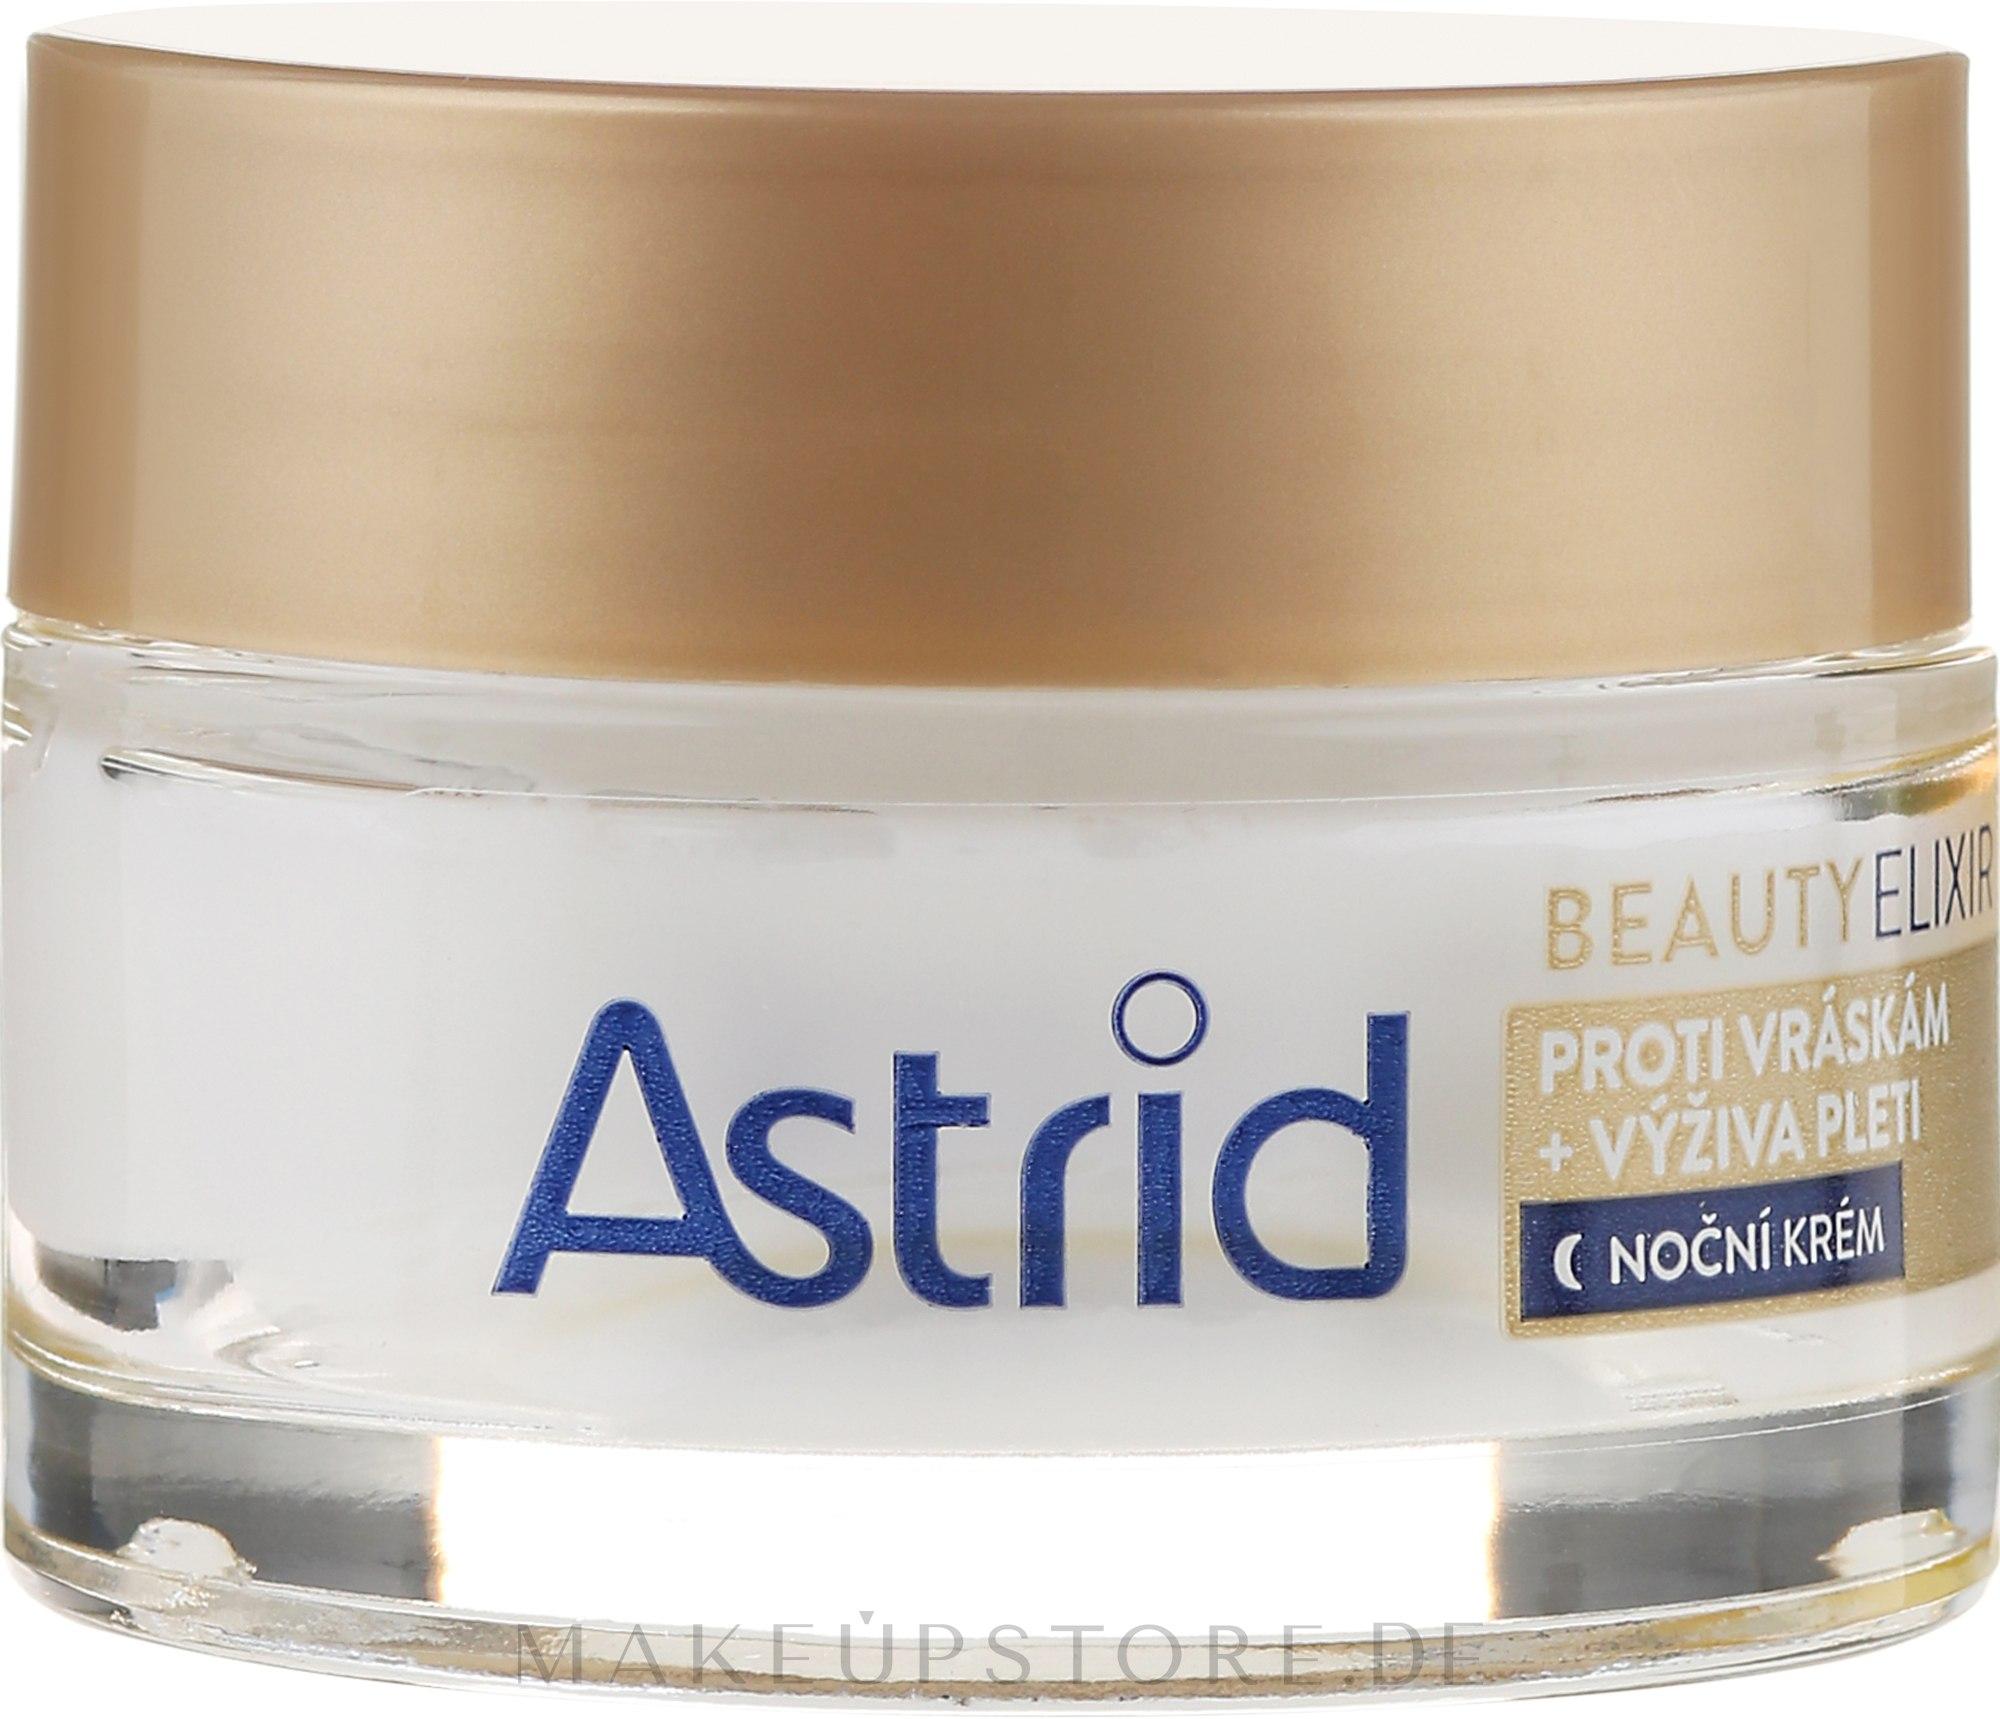 Feuchtigkeitsspendende Anti-Falten Nachtcreme - Astrid Moisturizing Anti-Wrinkle Day Night Cream — Bild 50 ml